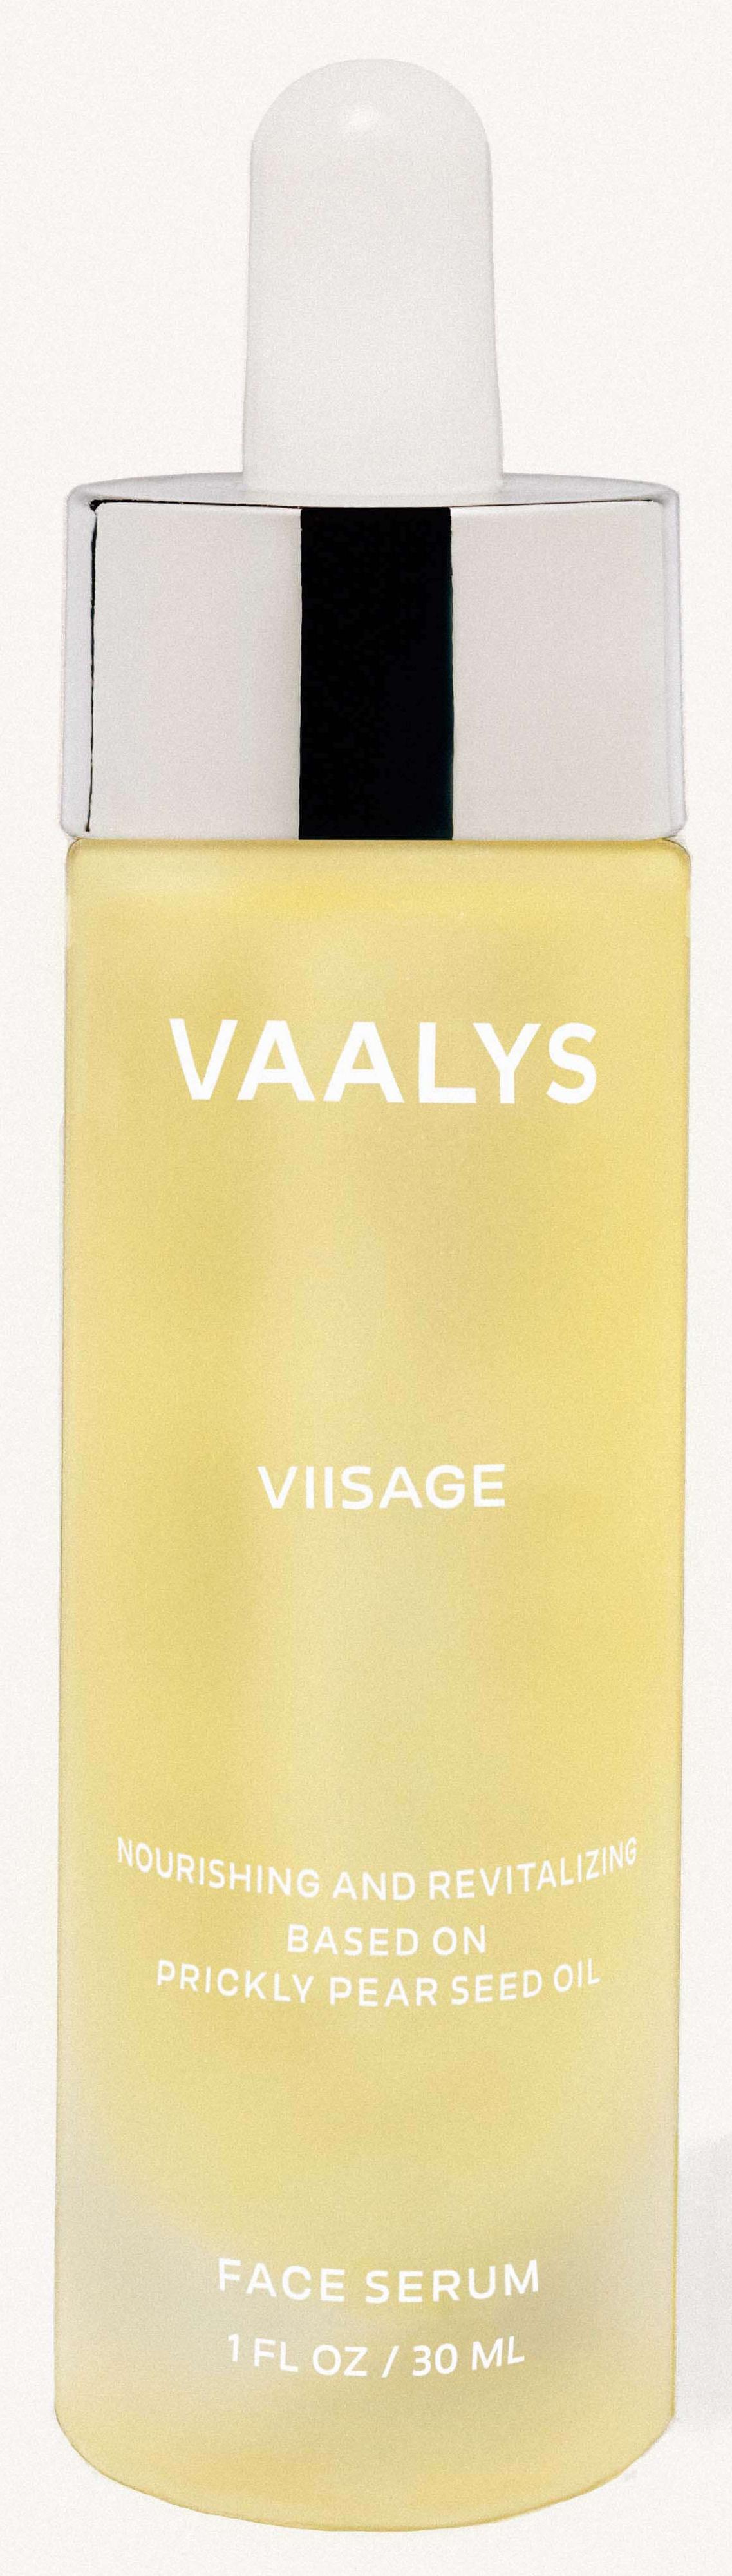 VAALYS Viisage Face Serum